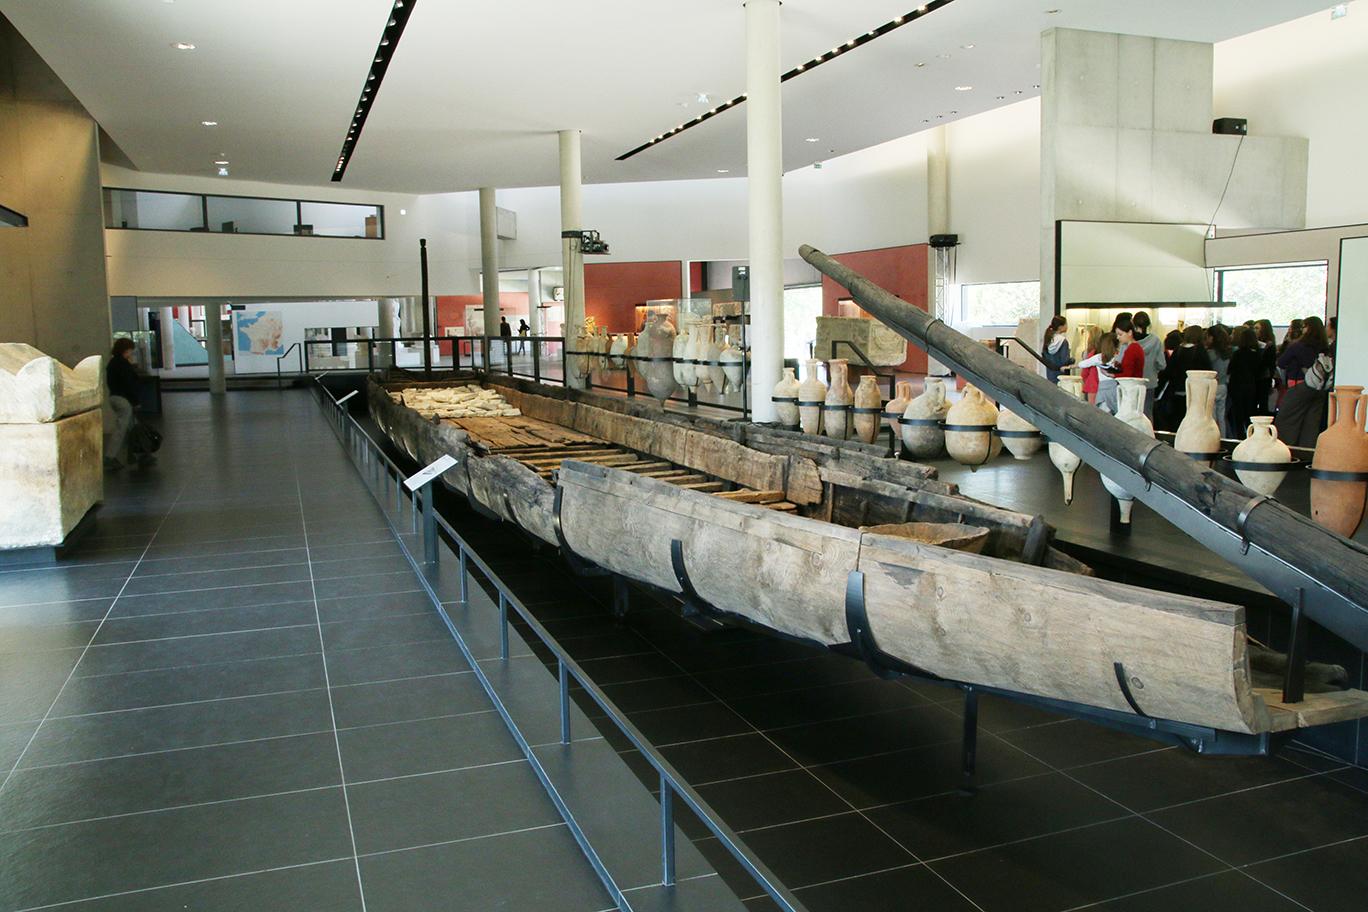 musee_decouverte_arles_antique_congres